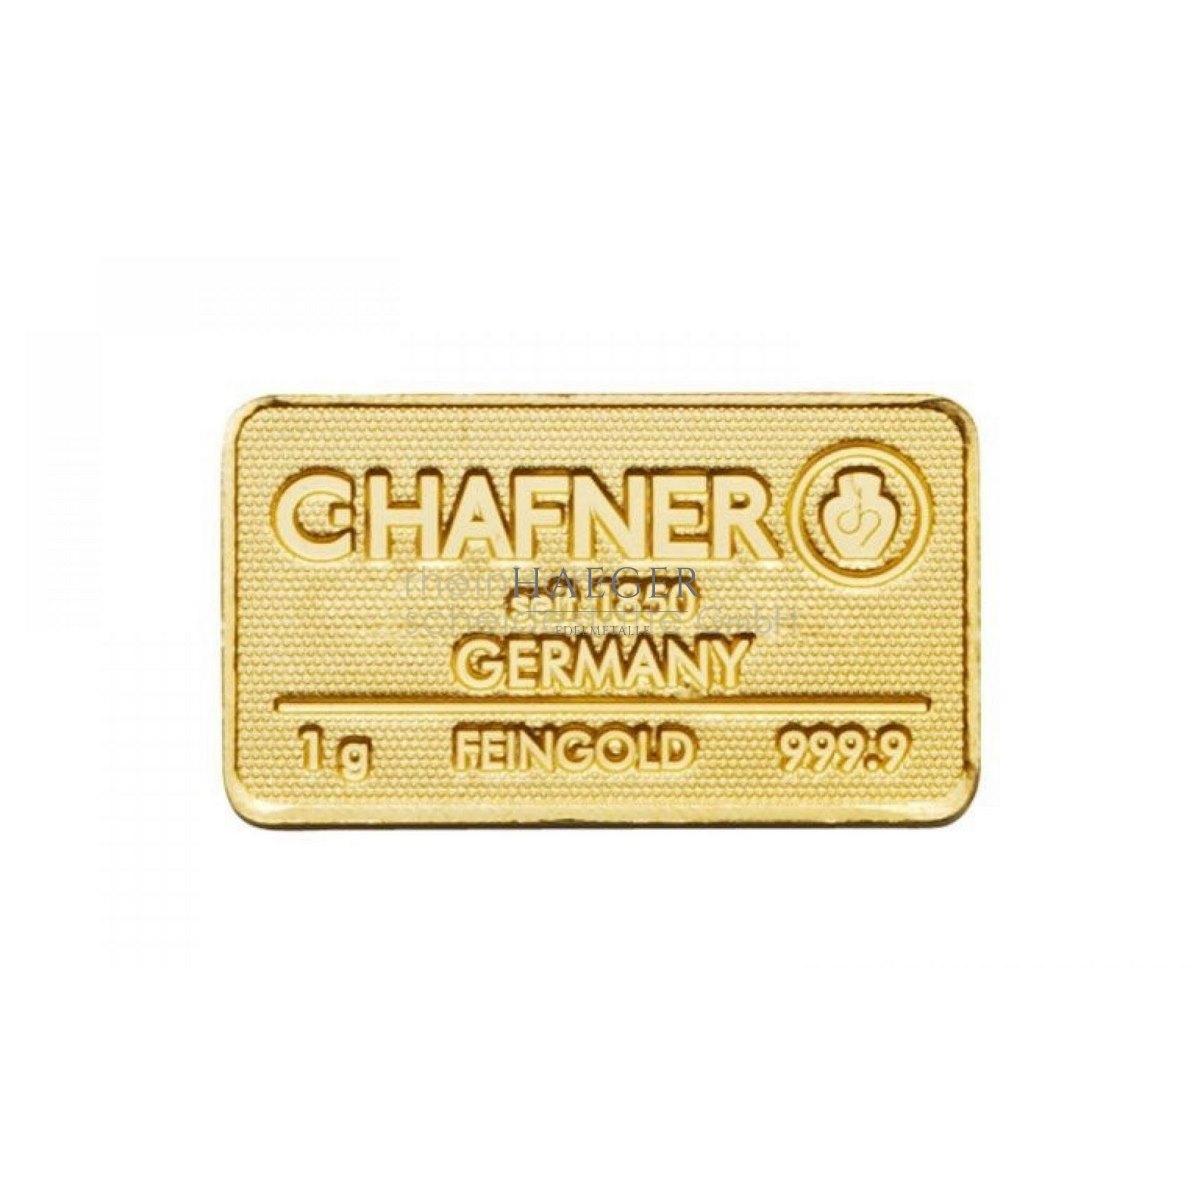 1g Goldbarren Hafner c